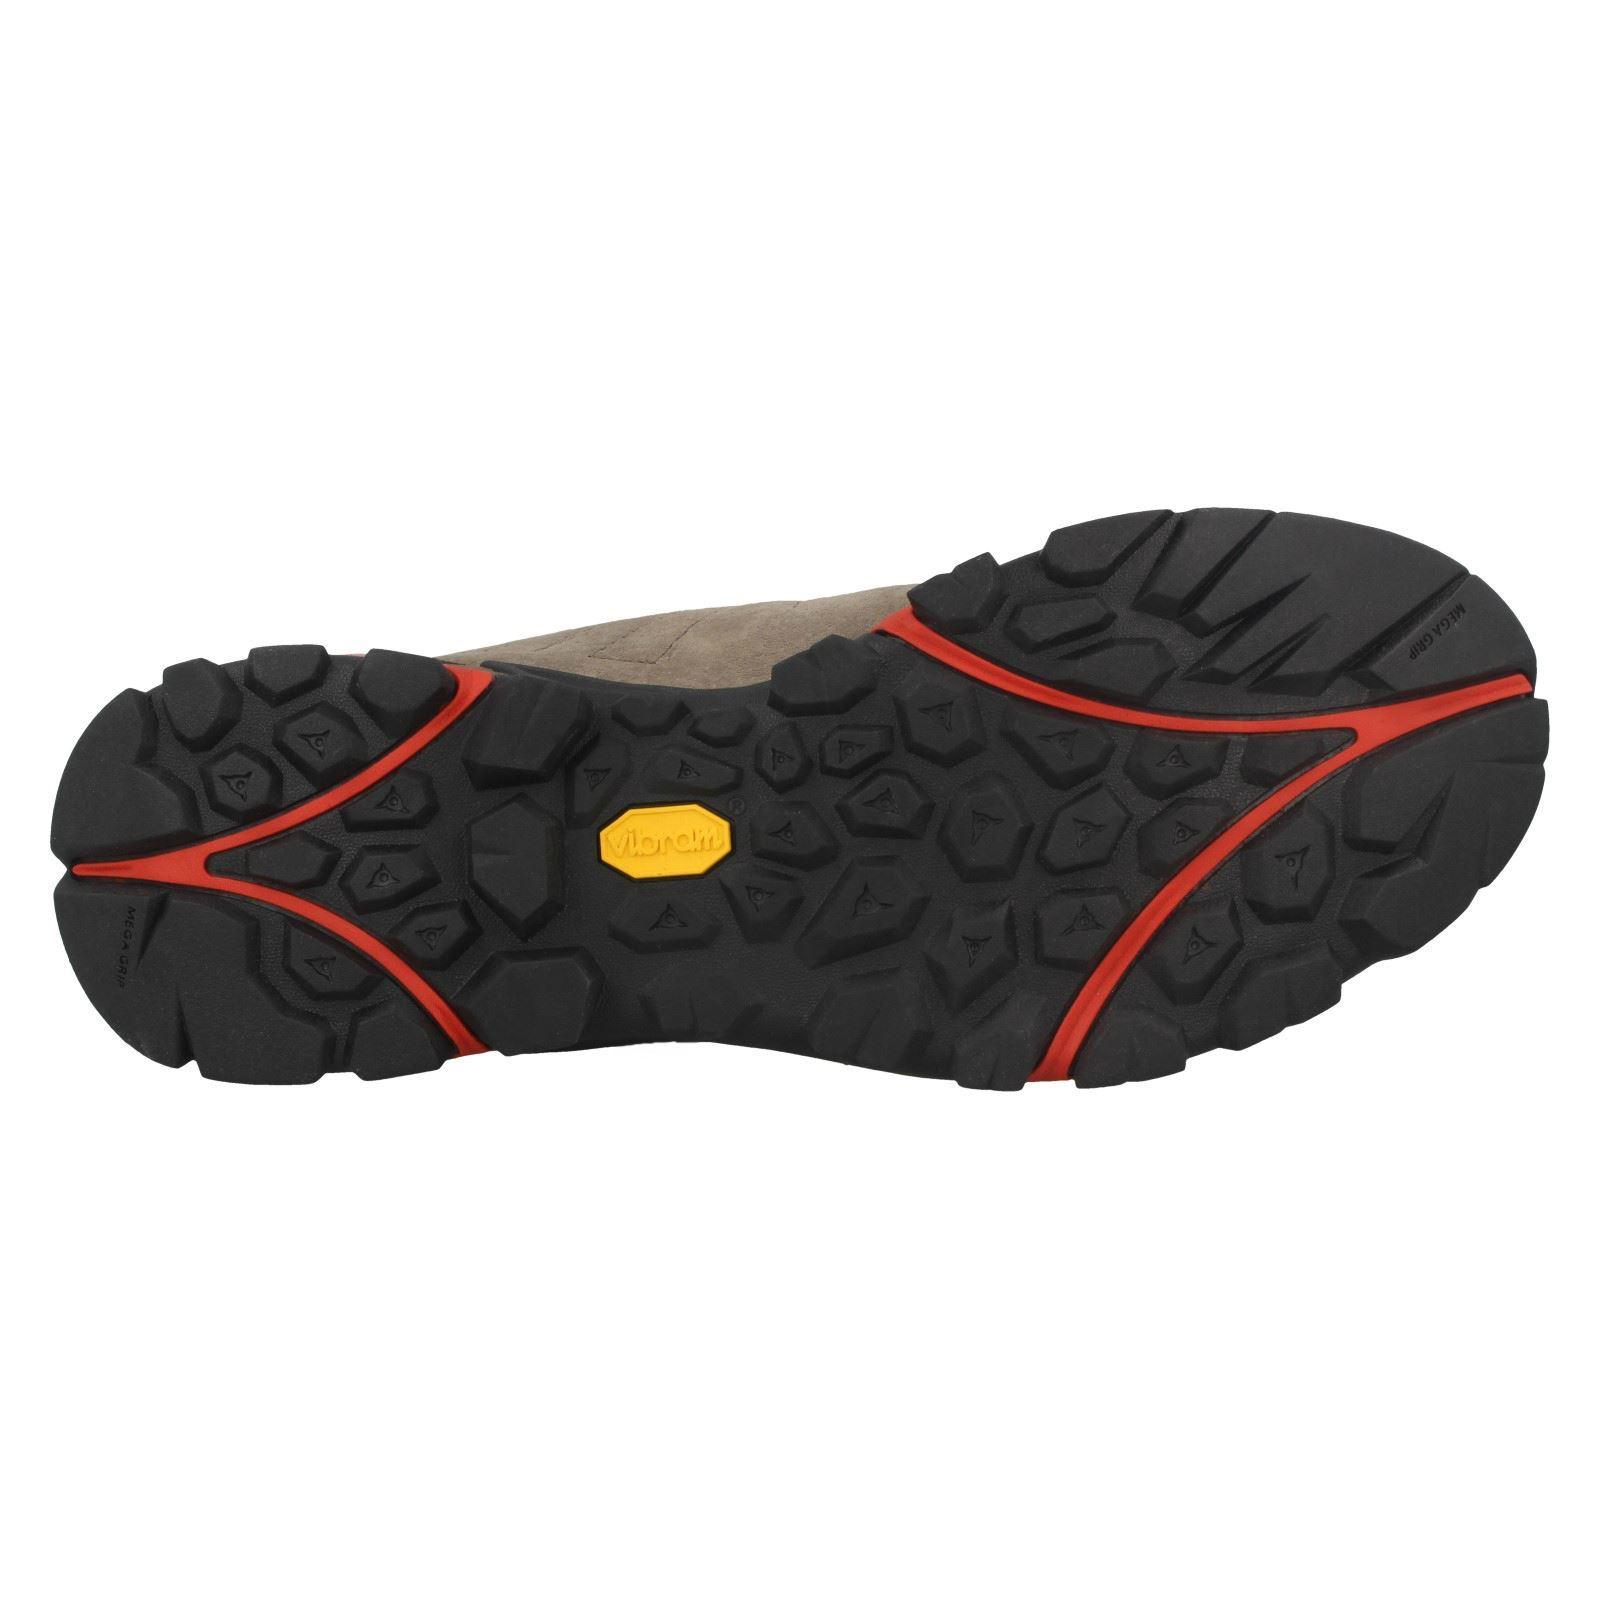 Herren Merrell Capra Walking Stiefel Style - Capra Merrell Mid Gore-Tex b73798